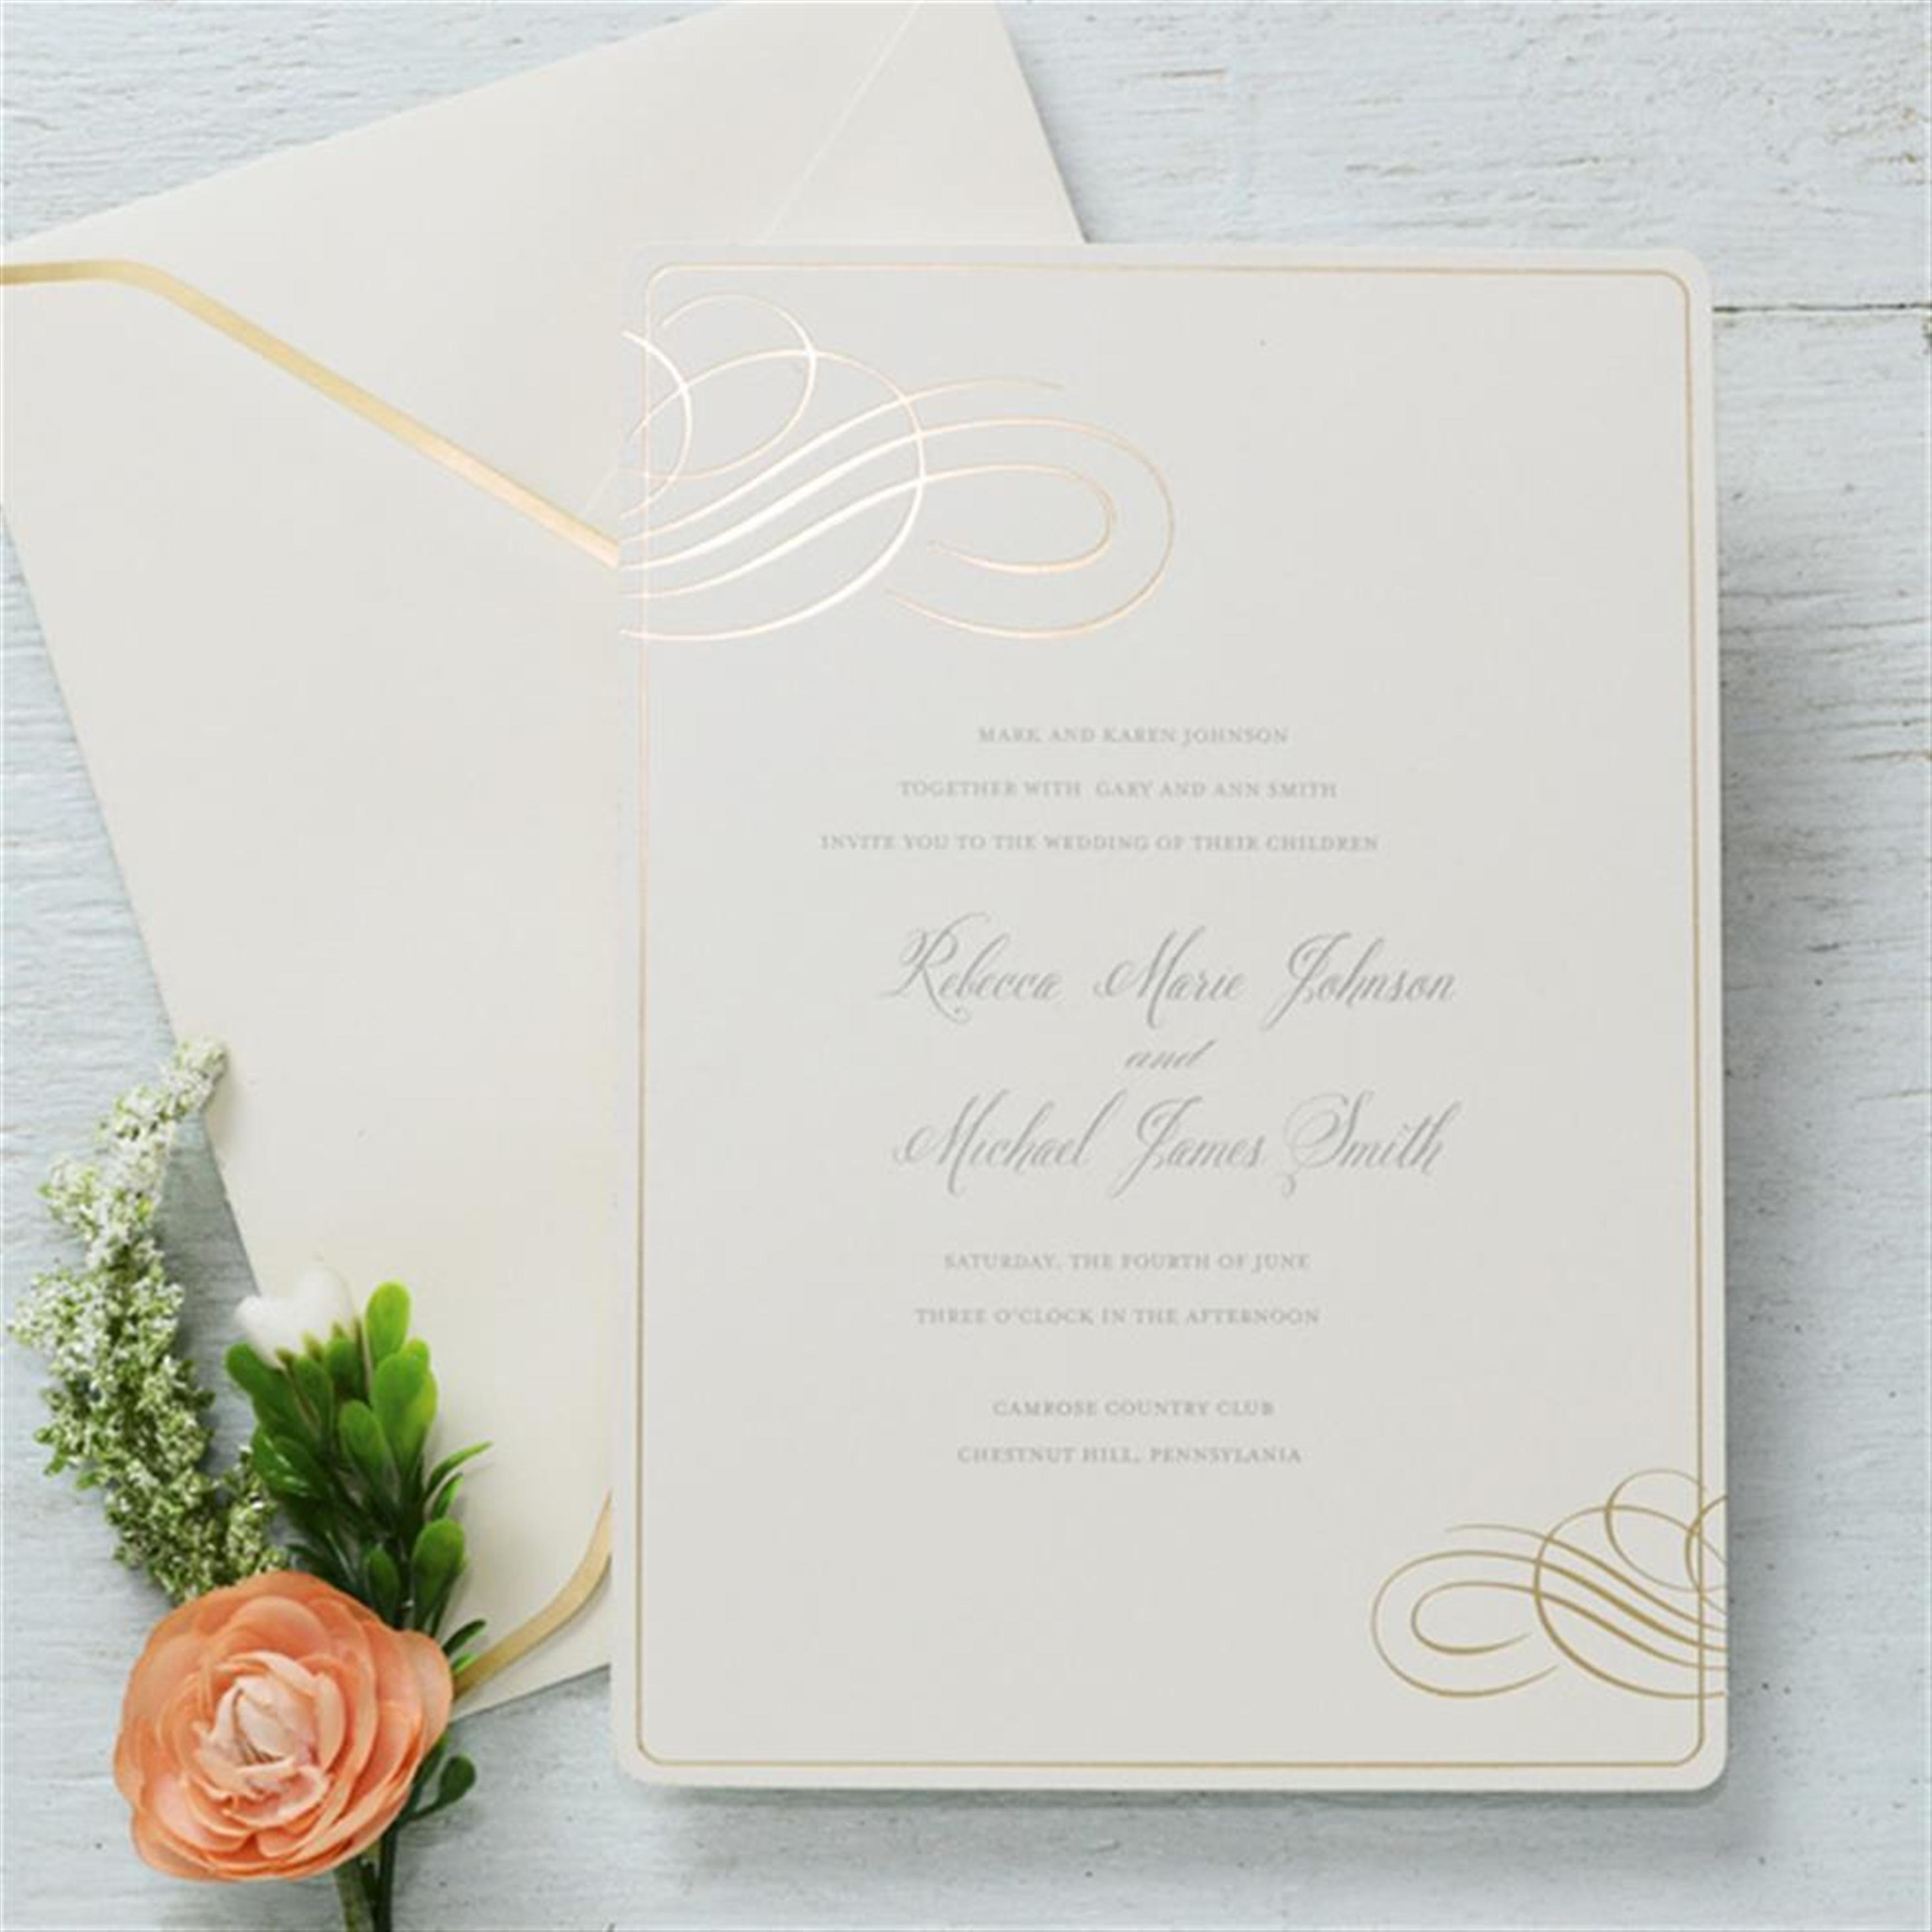 Gold Foil Embossed Invitations | Wedding Invitations | Pinterest ...